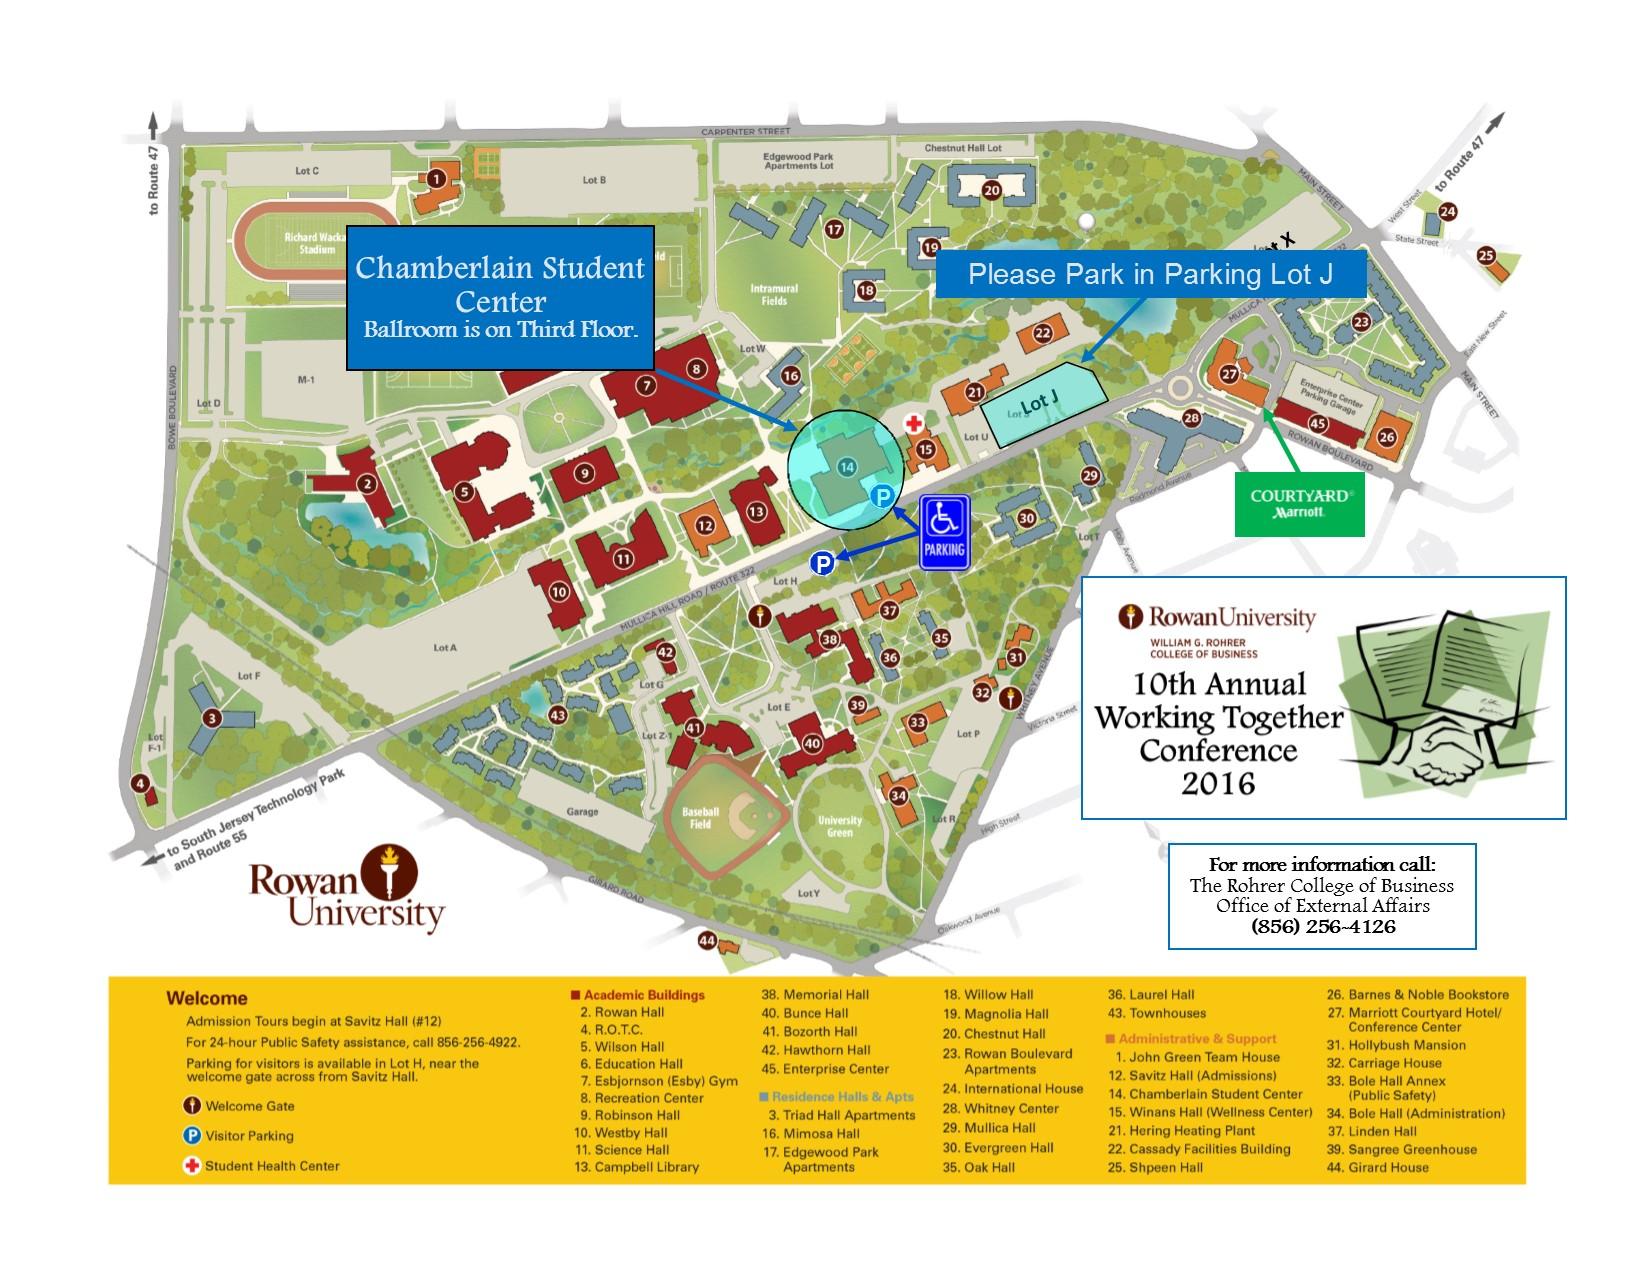 rowan university map vproject